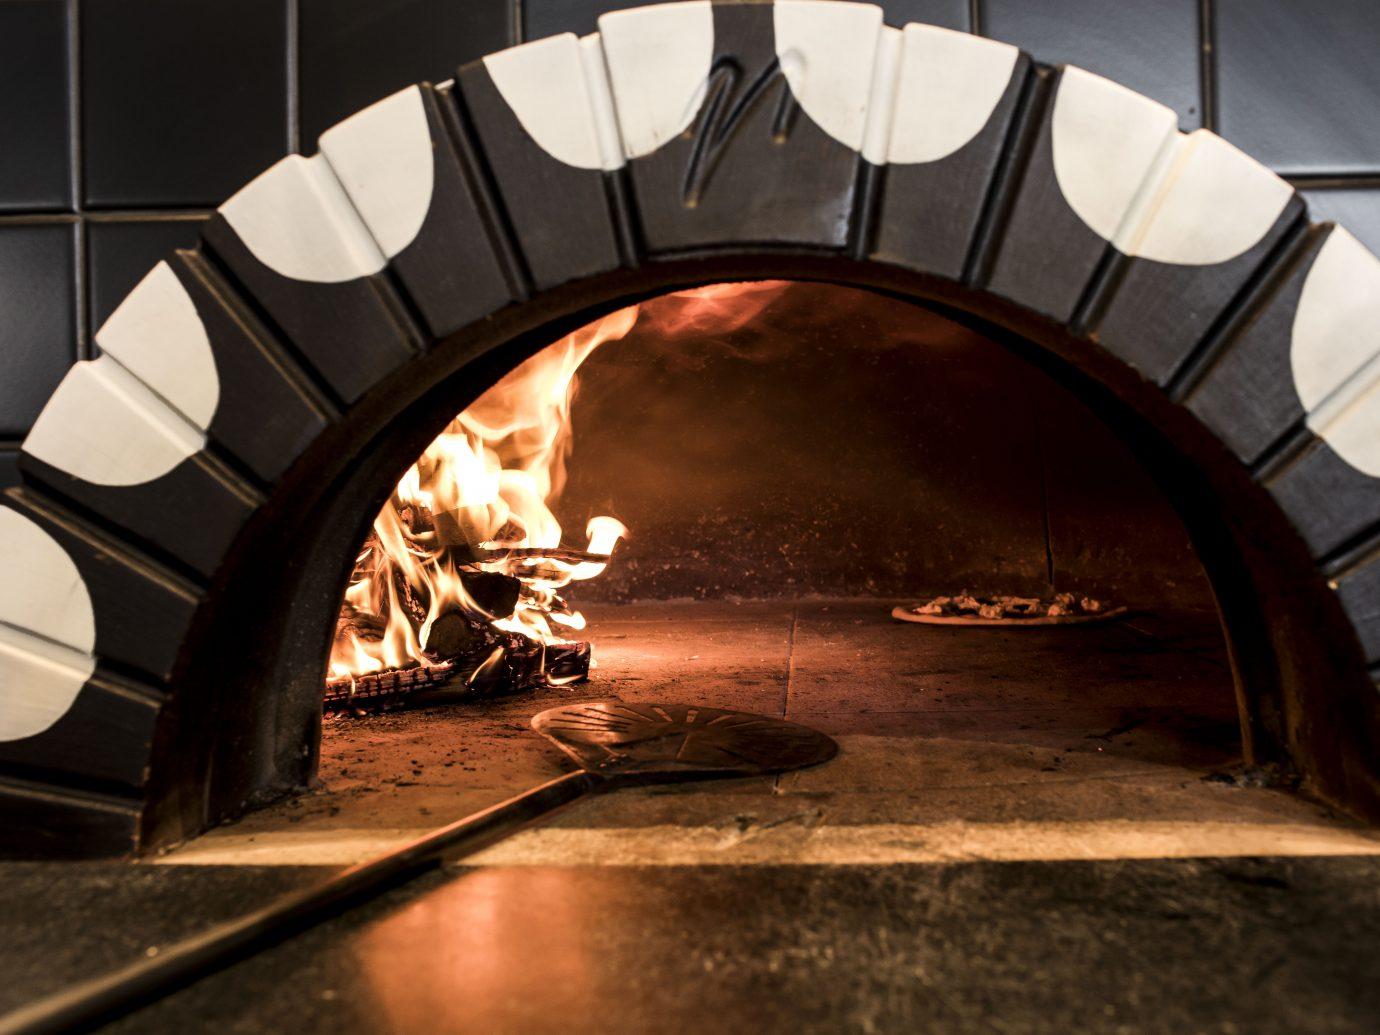 Coal fire oven ablaze